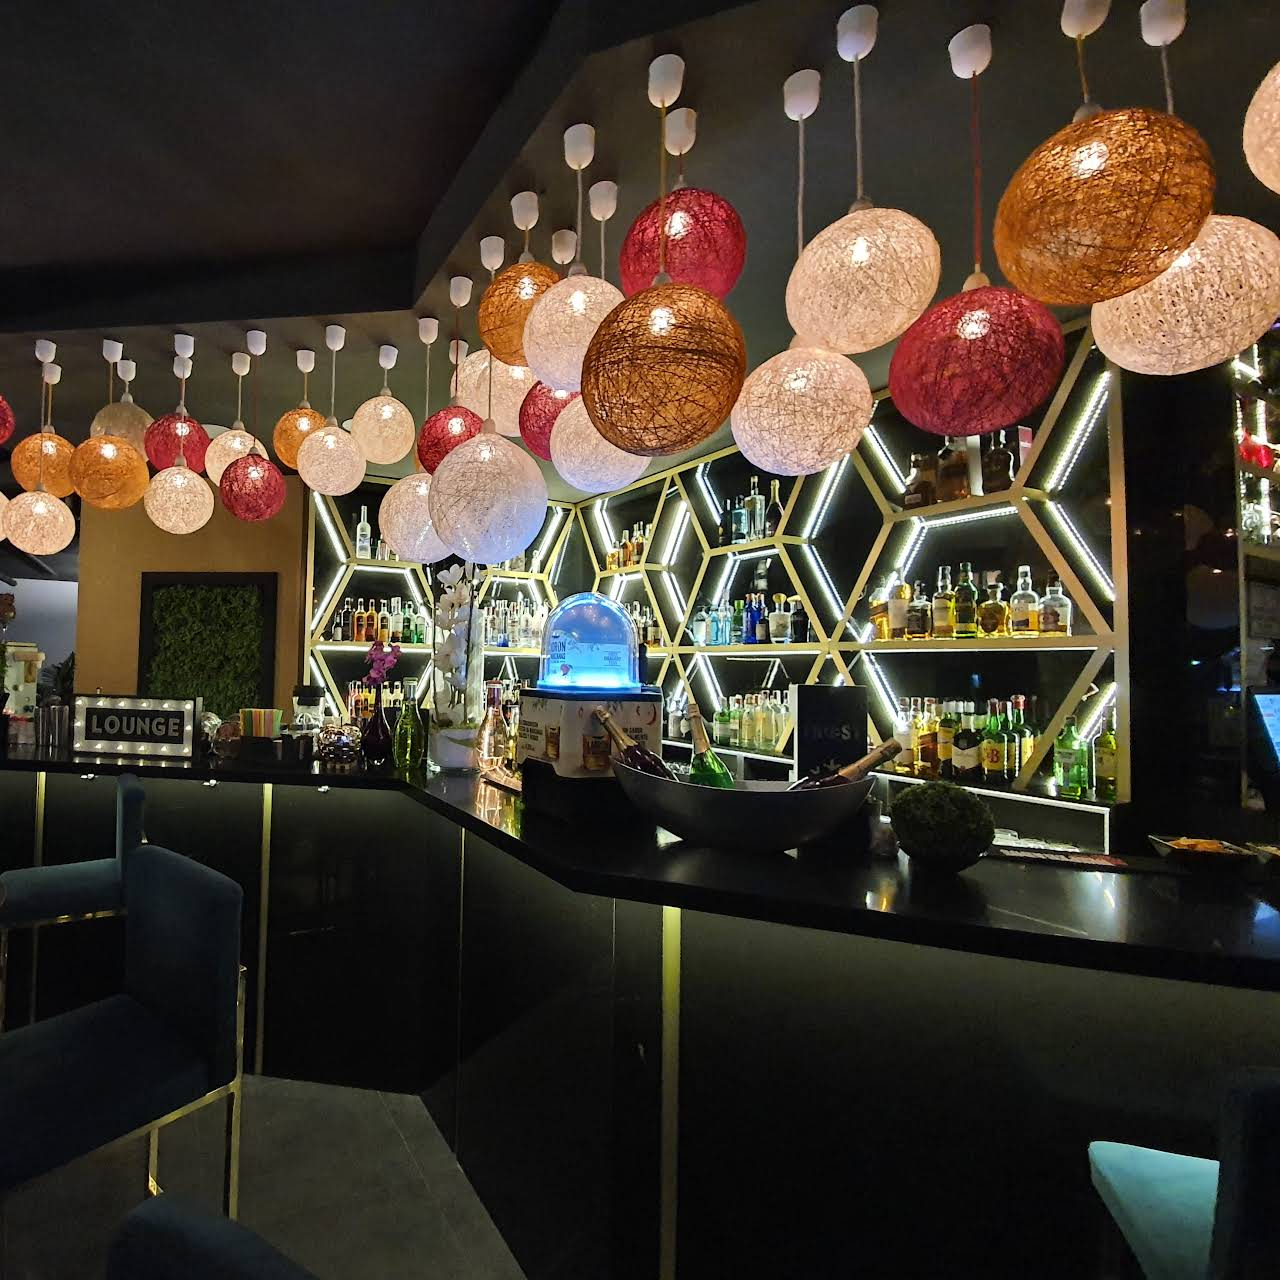 Pandora Cocktail And Shisha Fuenlabrada Ven A Disfrutar De